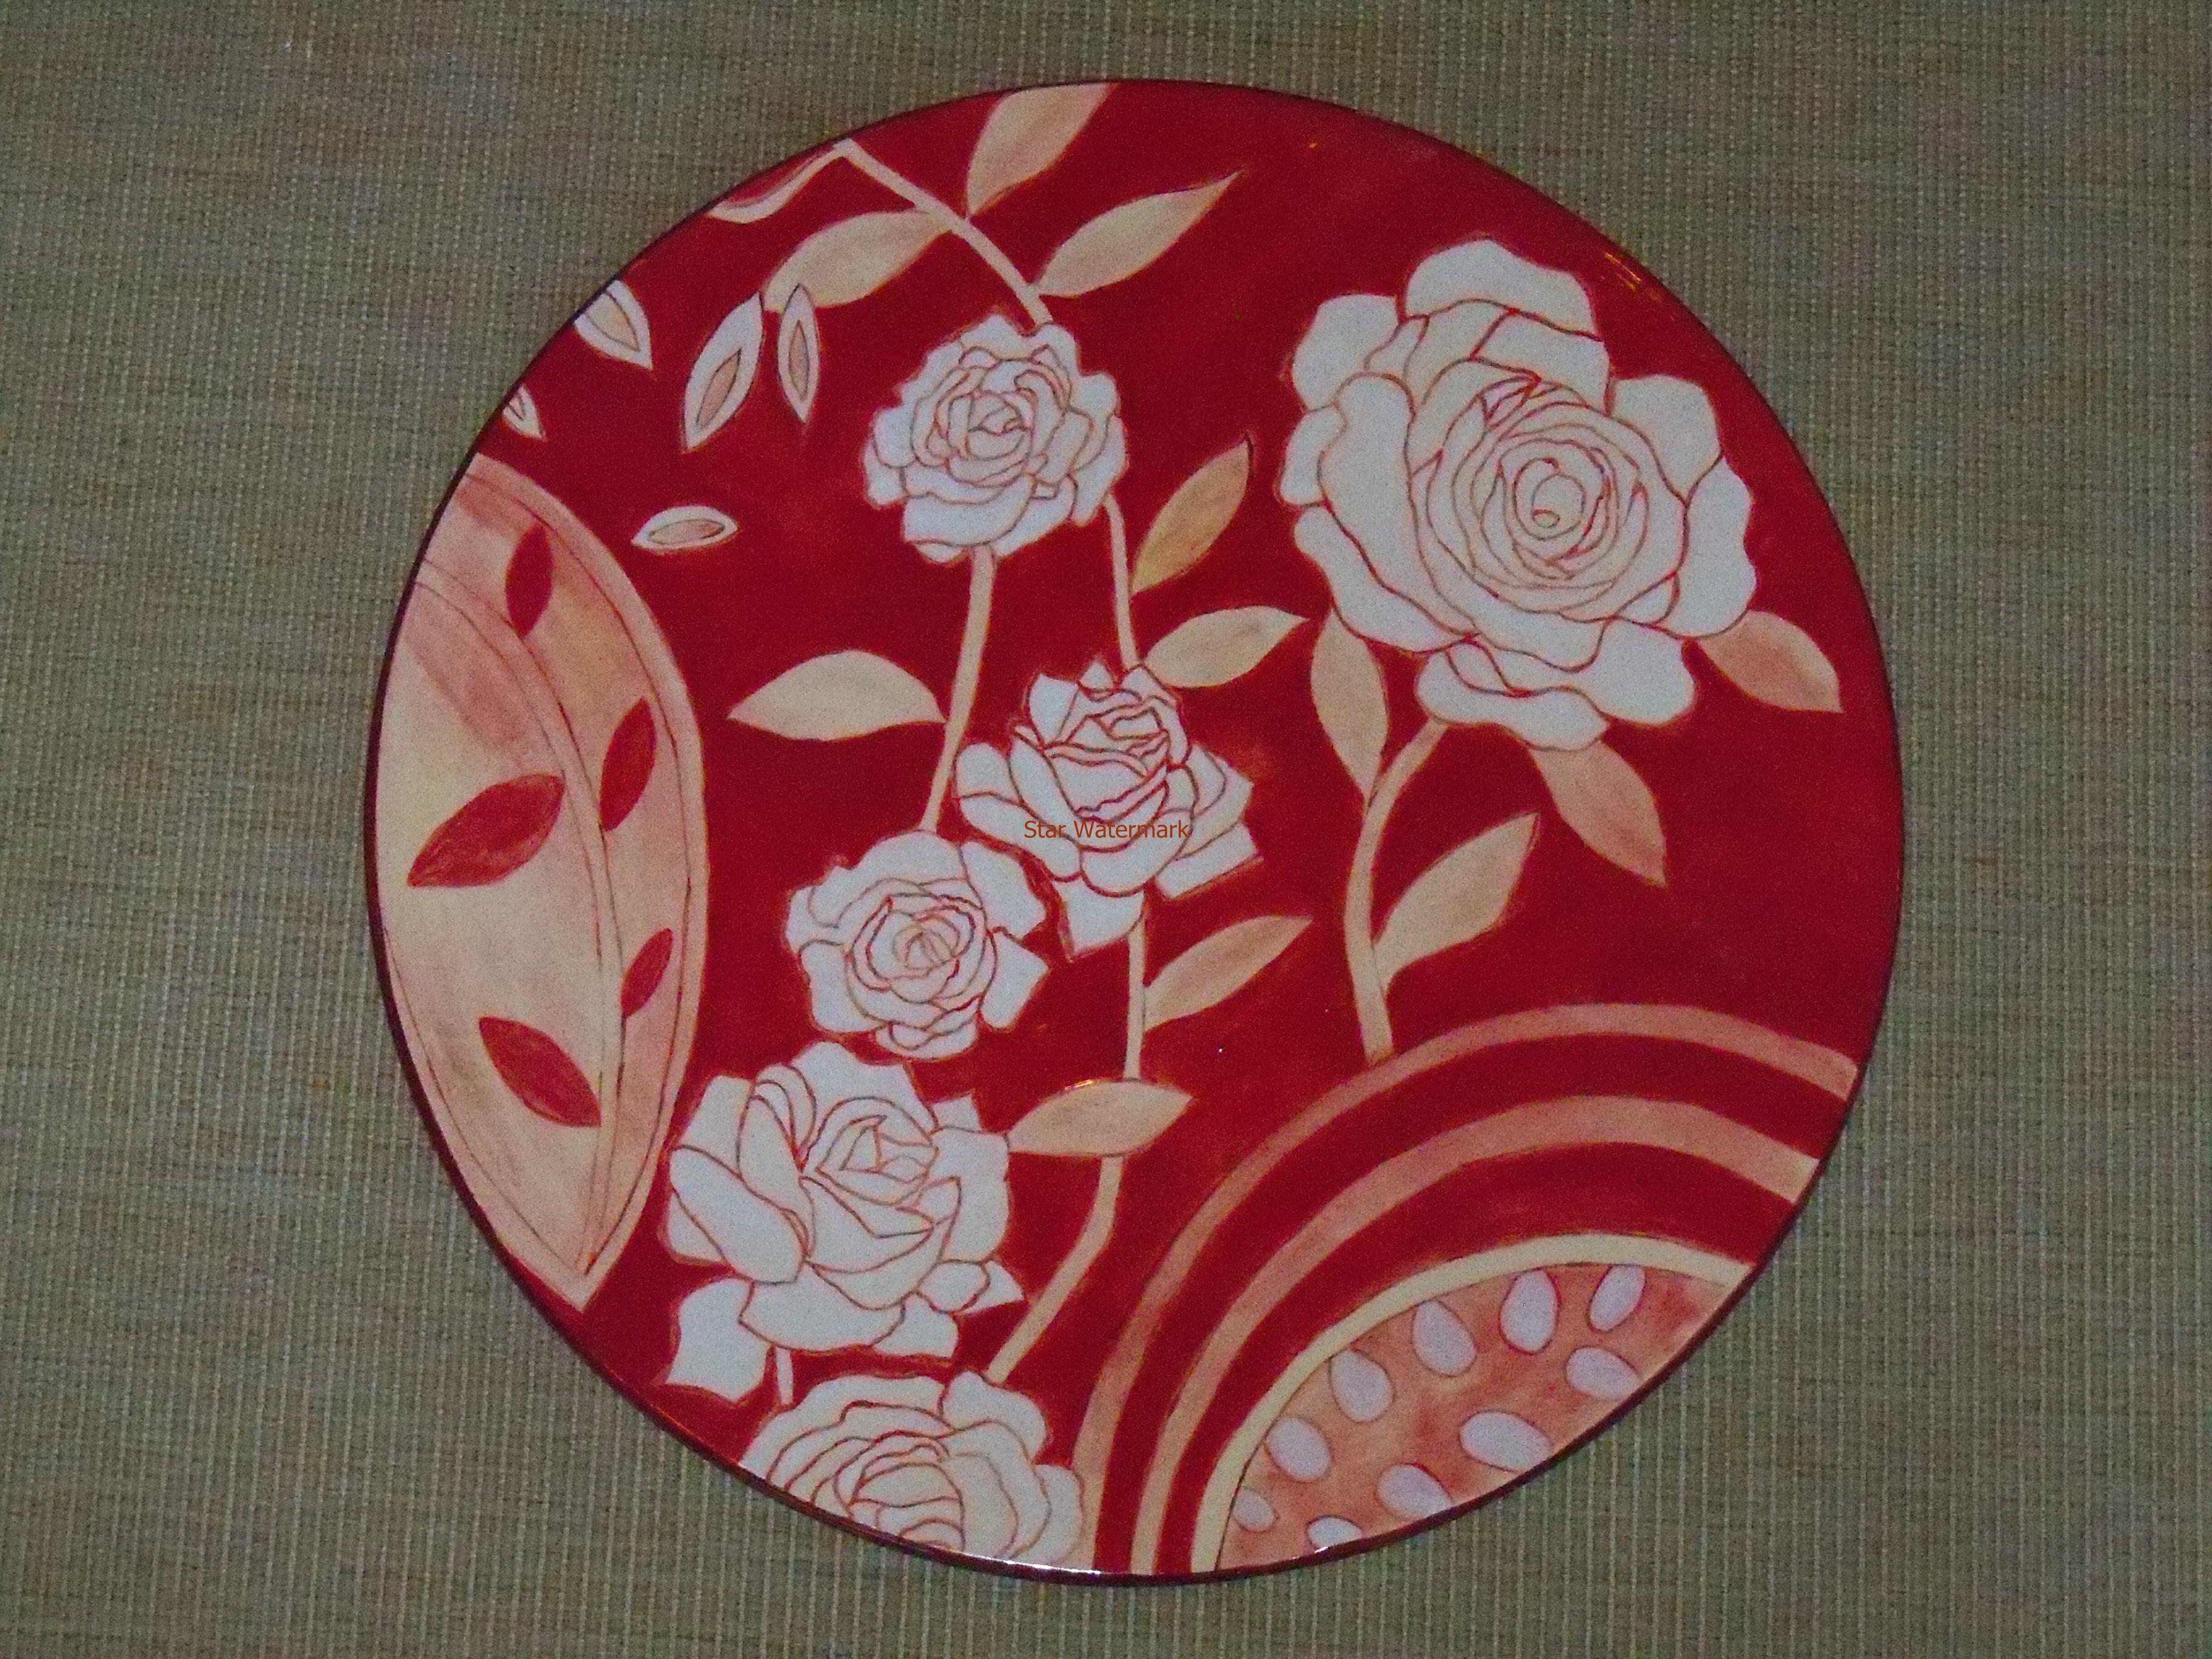 plate by Teresa Cristina Ferreira Braga